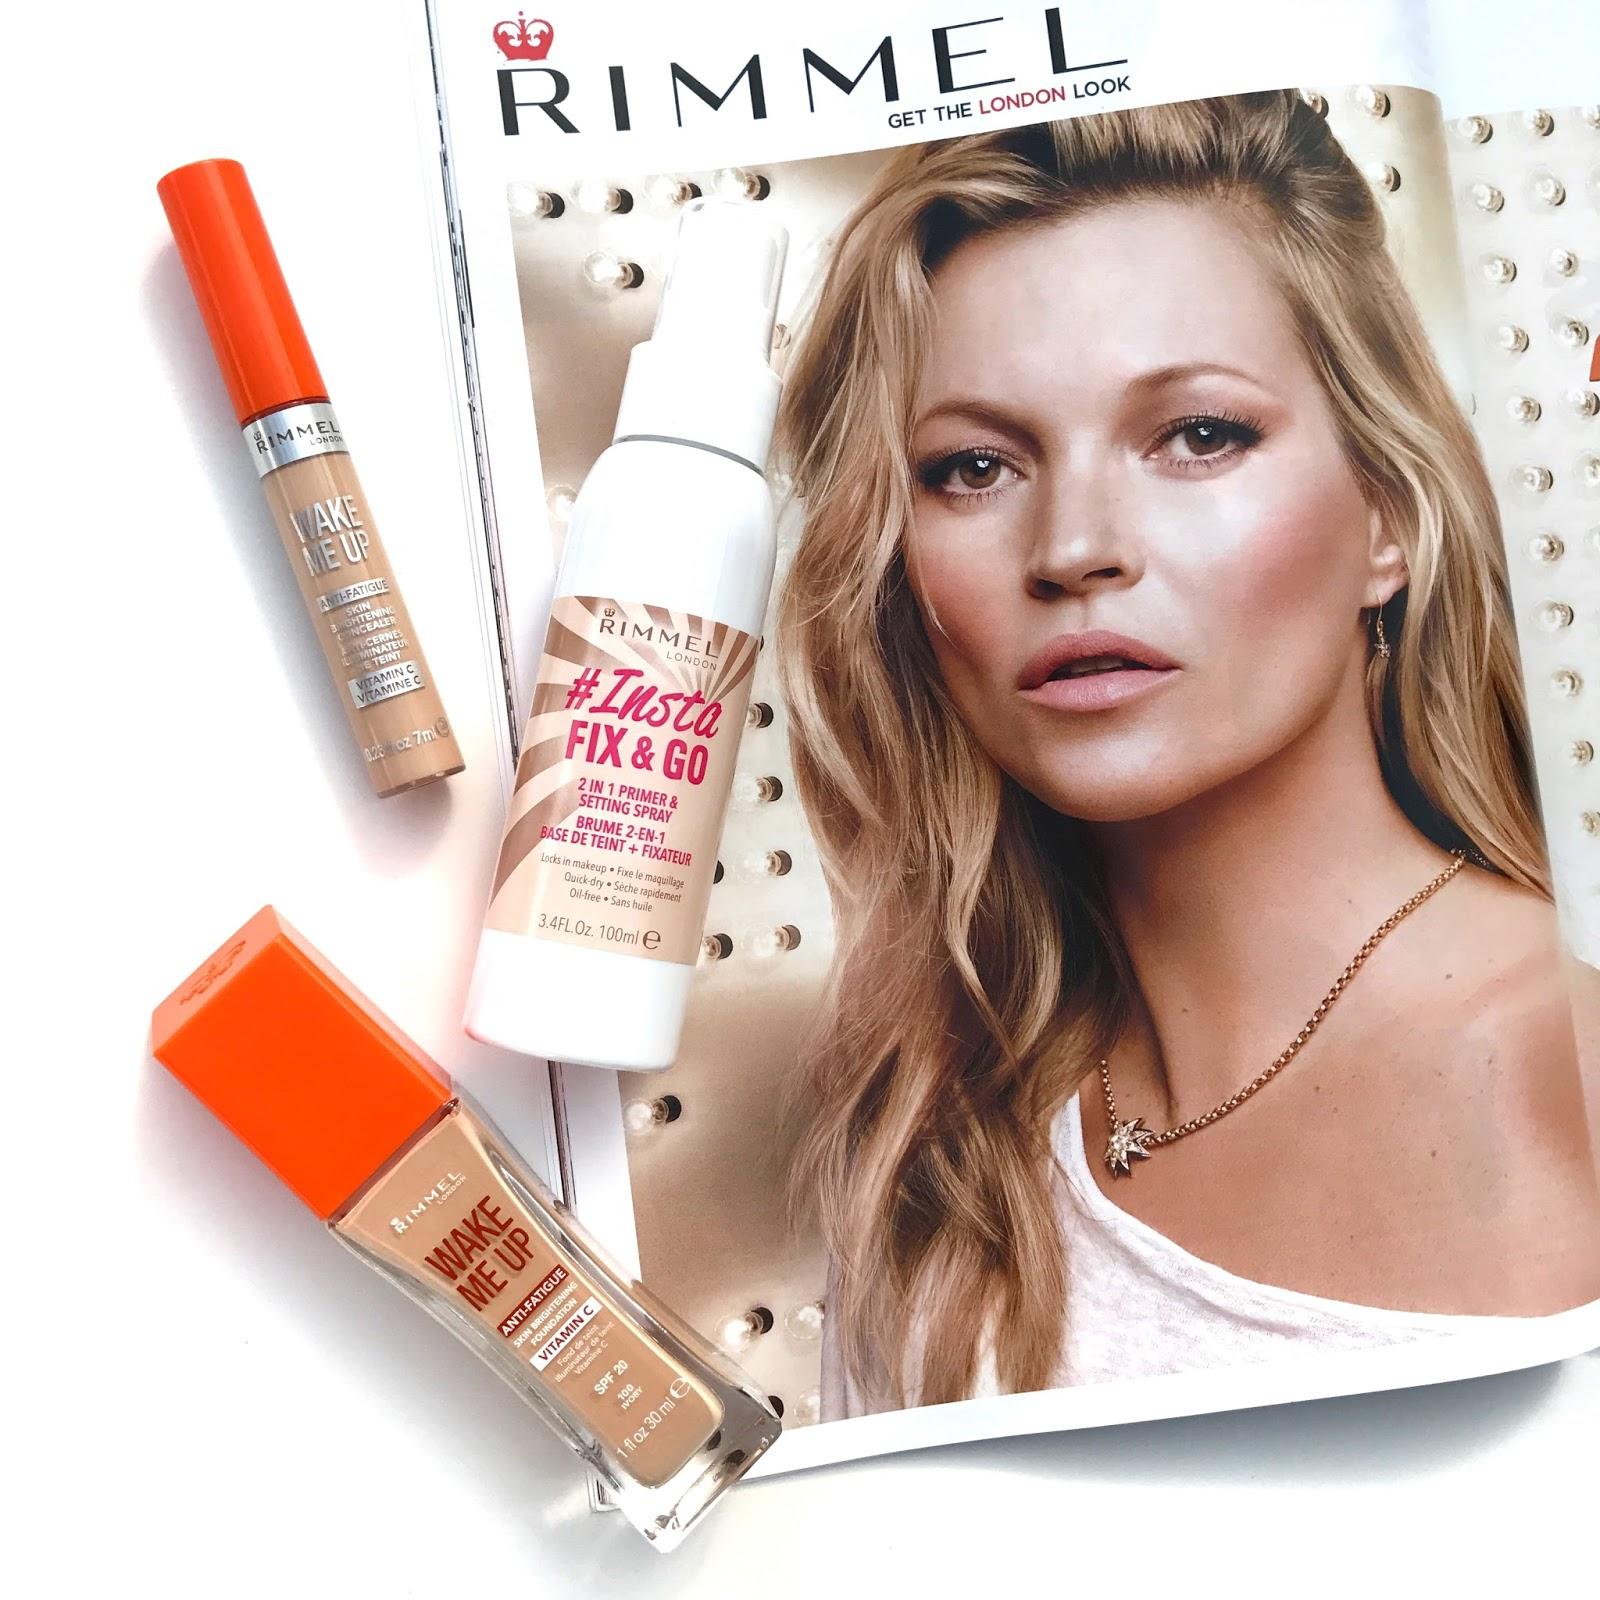 #Insta Fix & Go Setting Spray by Rimmel #17